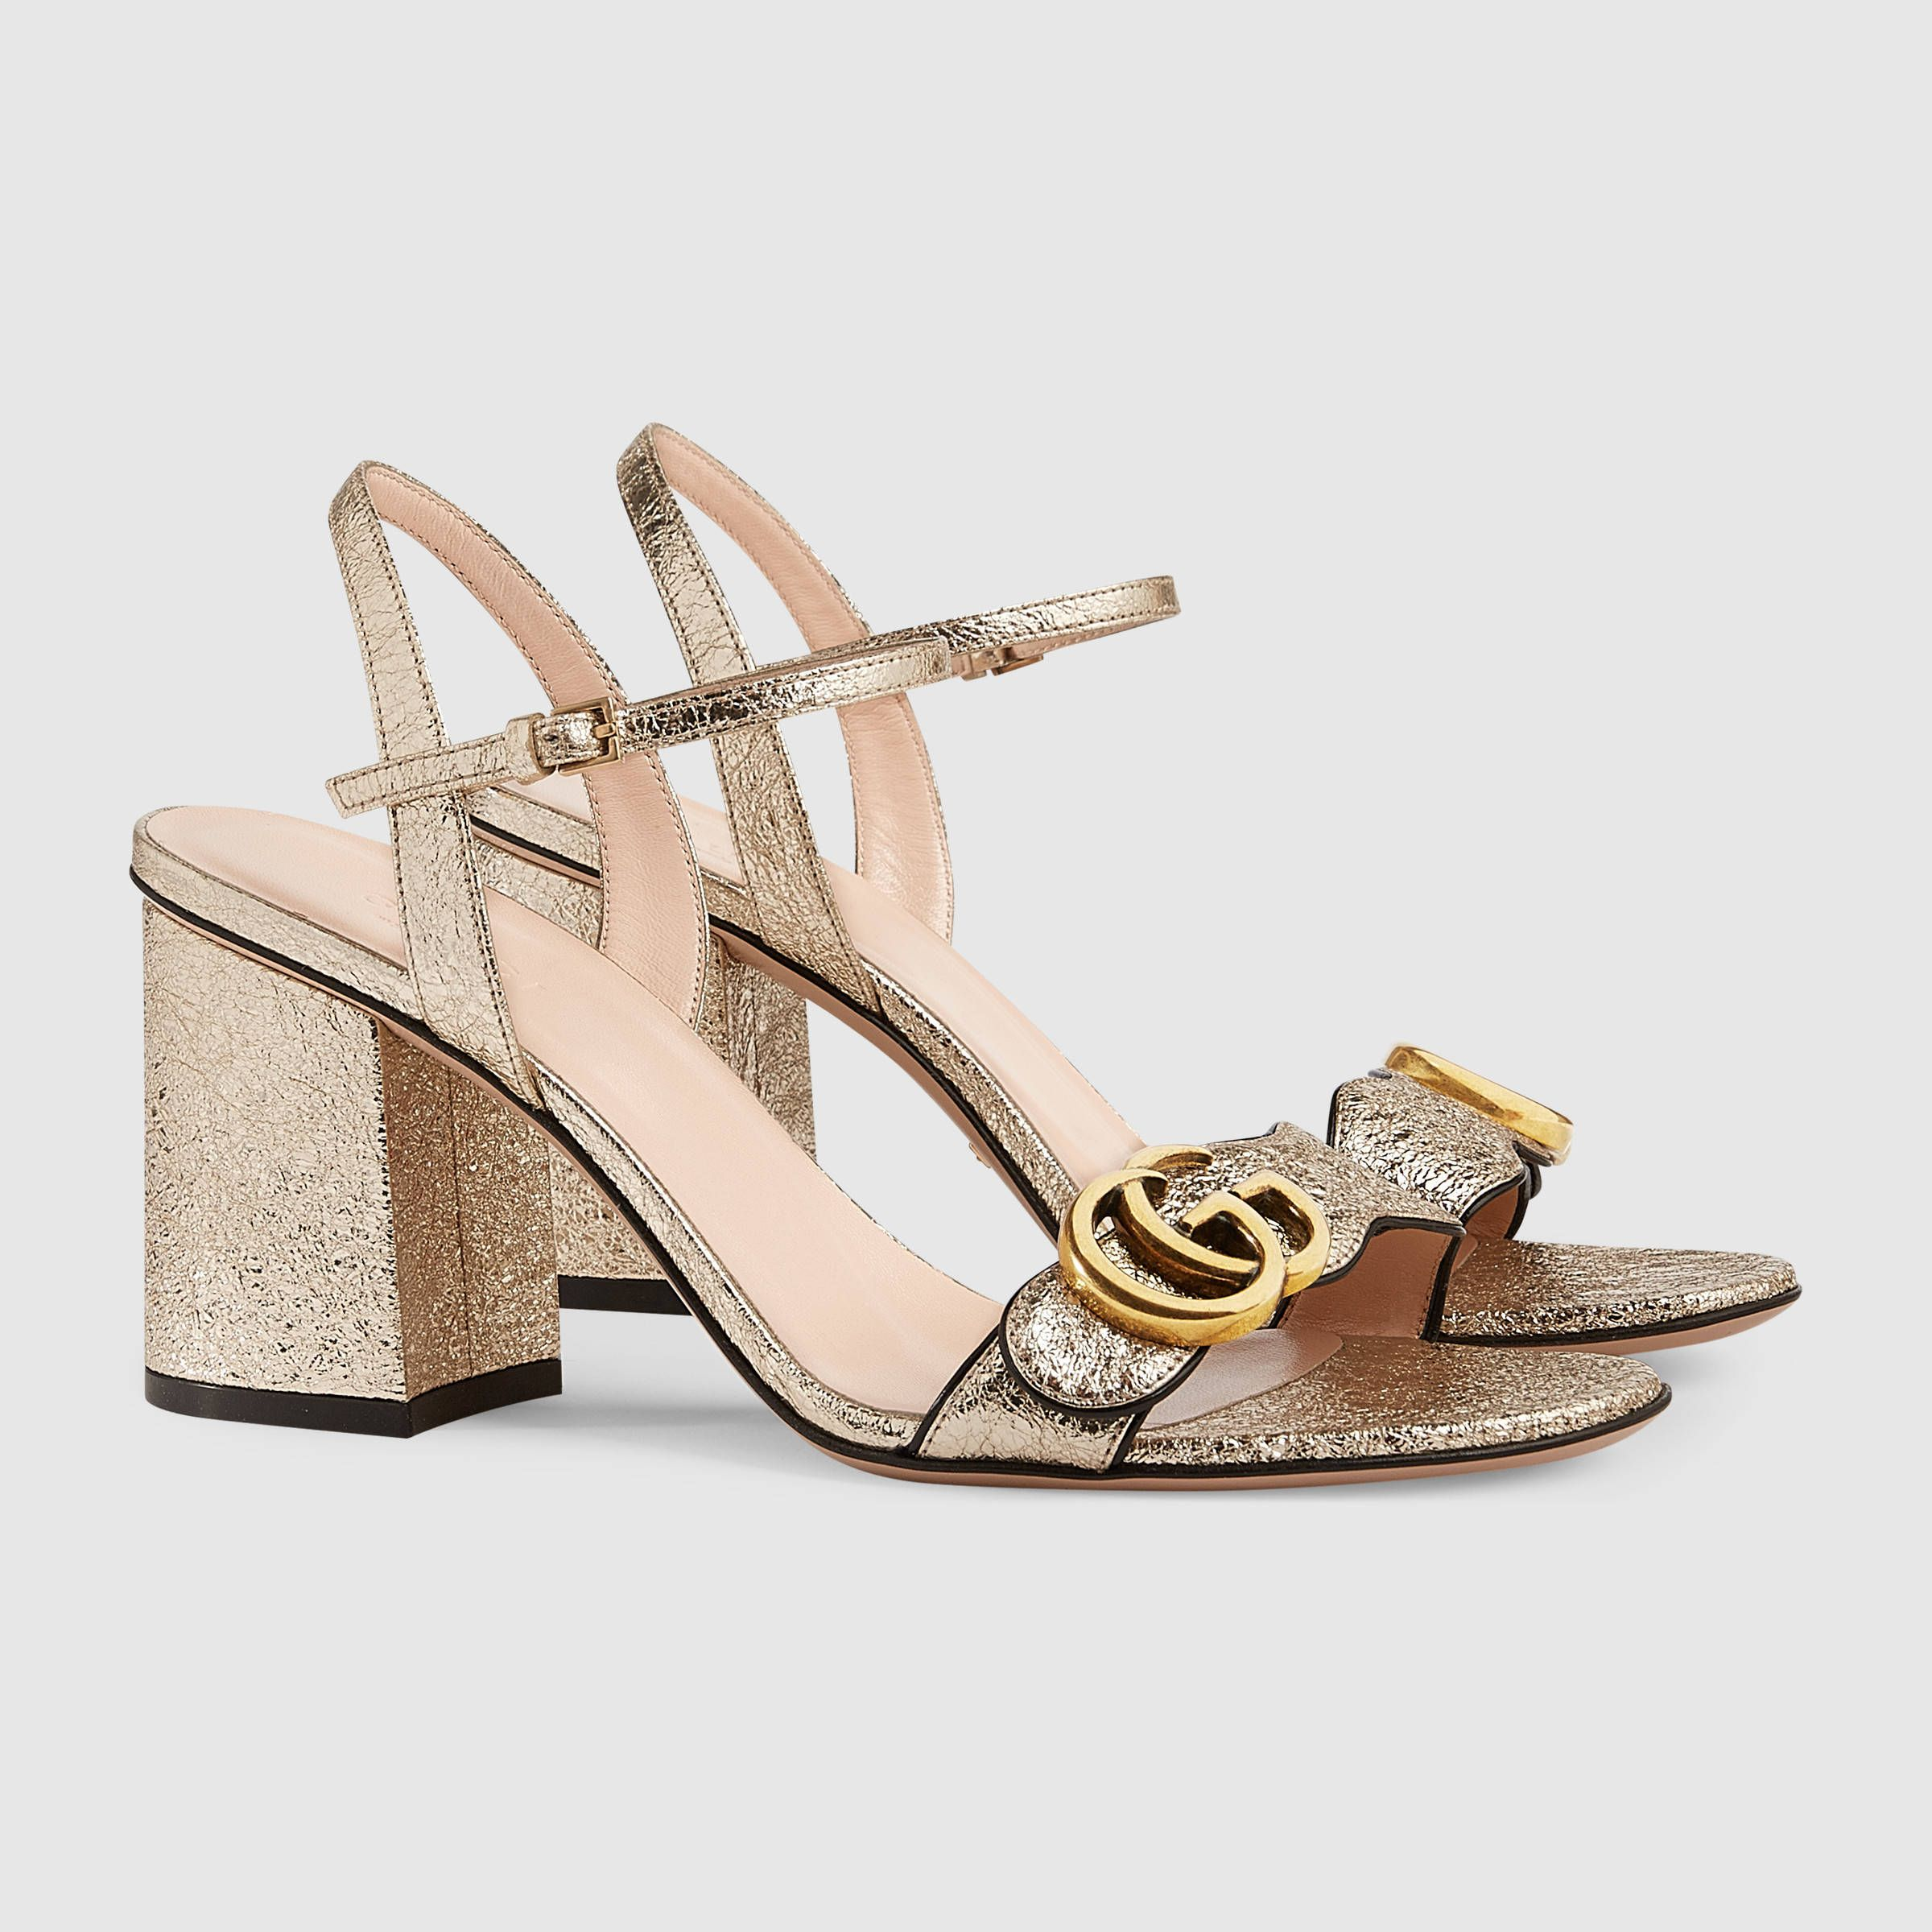 c6cf6a21e164 Gucci Metallic laminate leather mid-heel sandal Detail 2